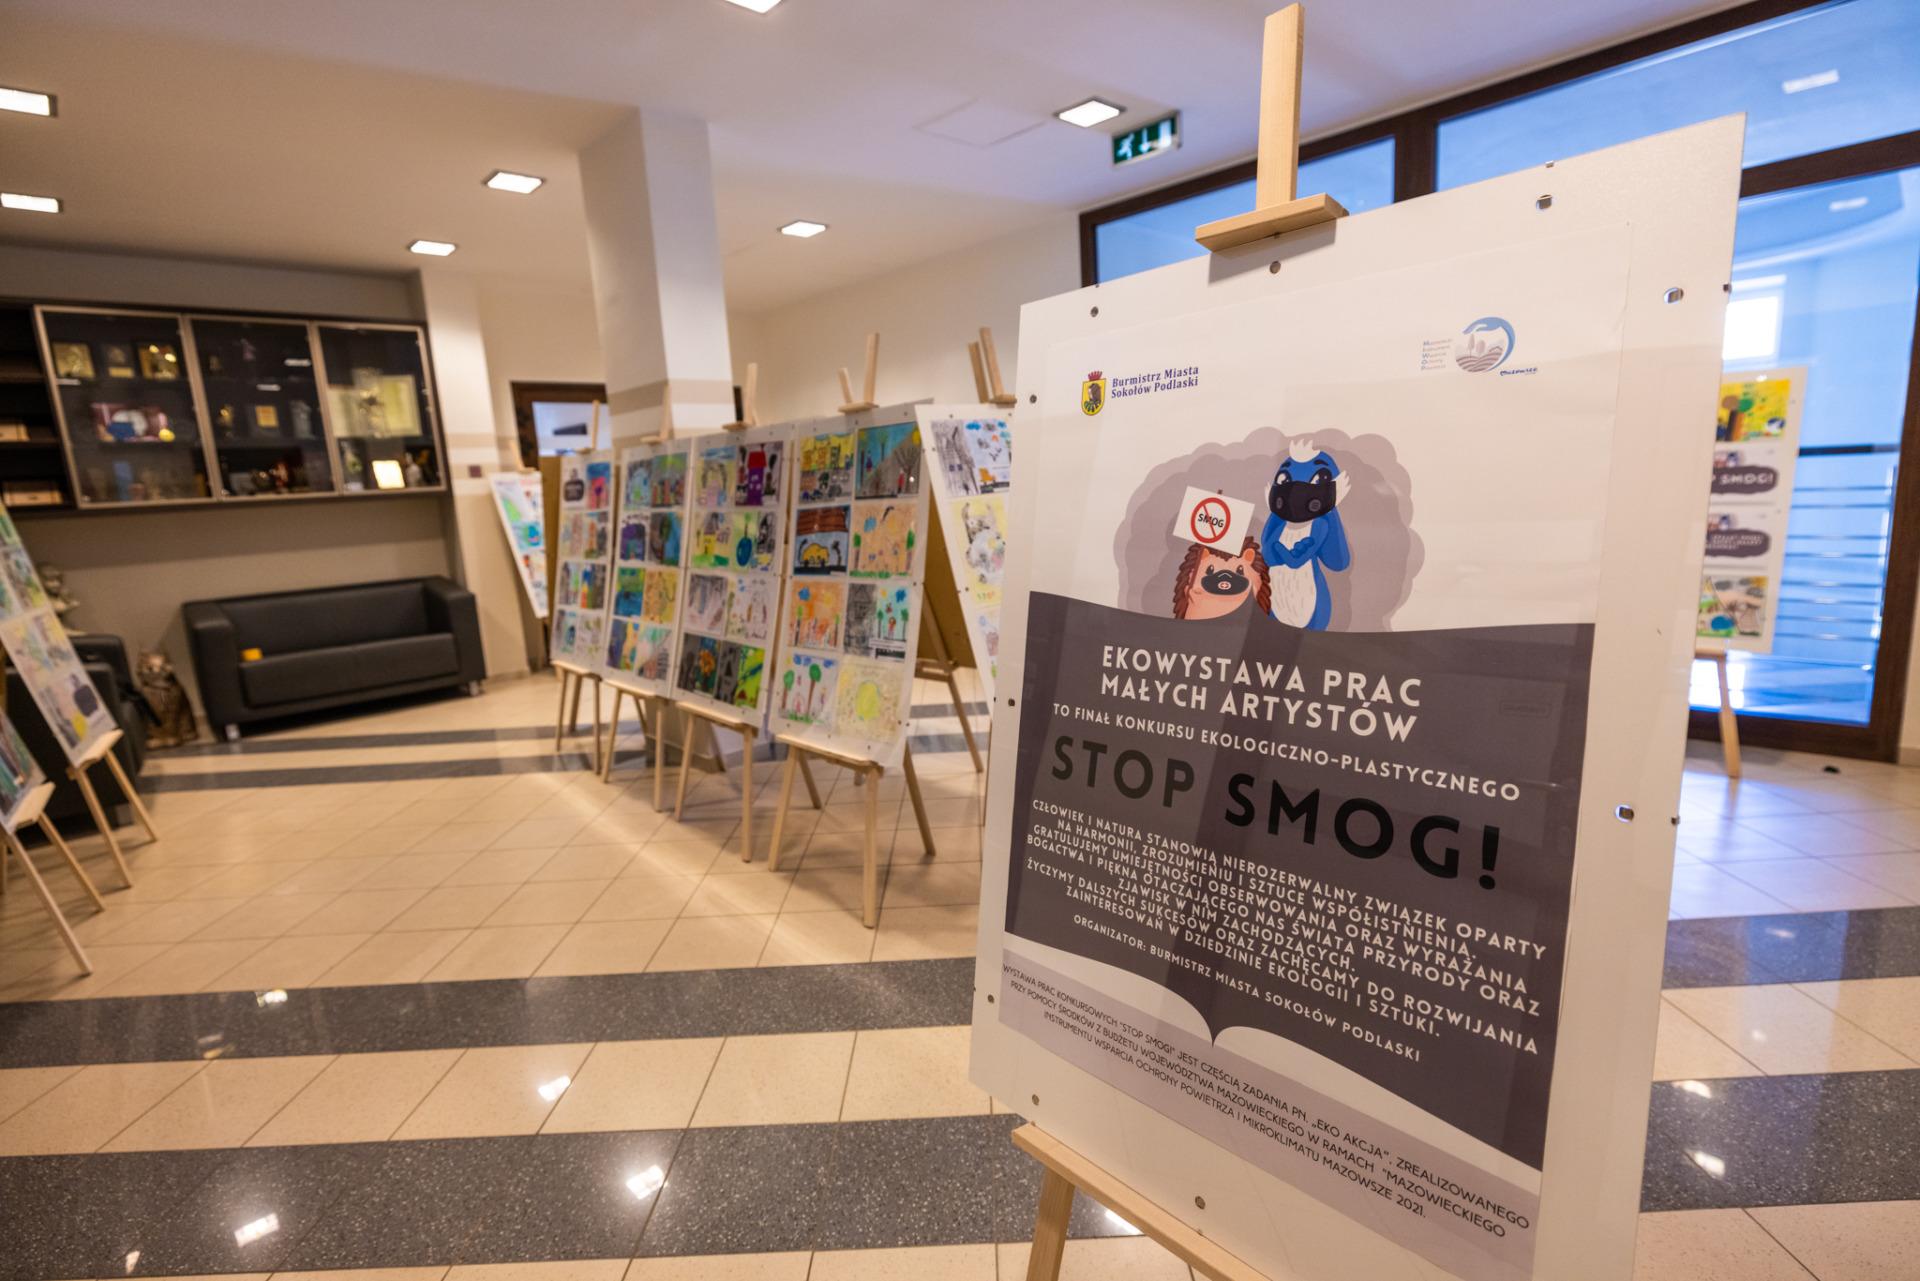 foto:  - Sokolow Zdjecia 11